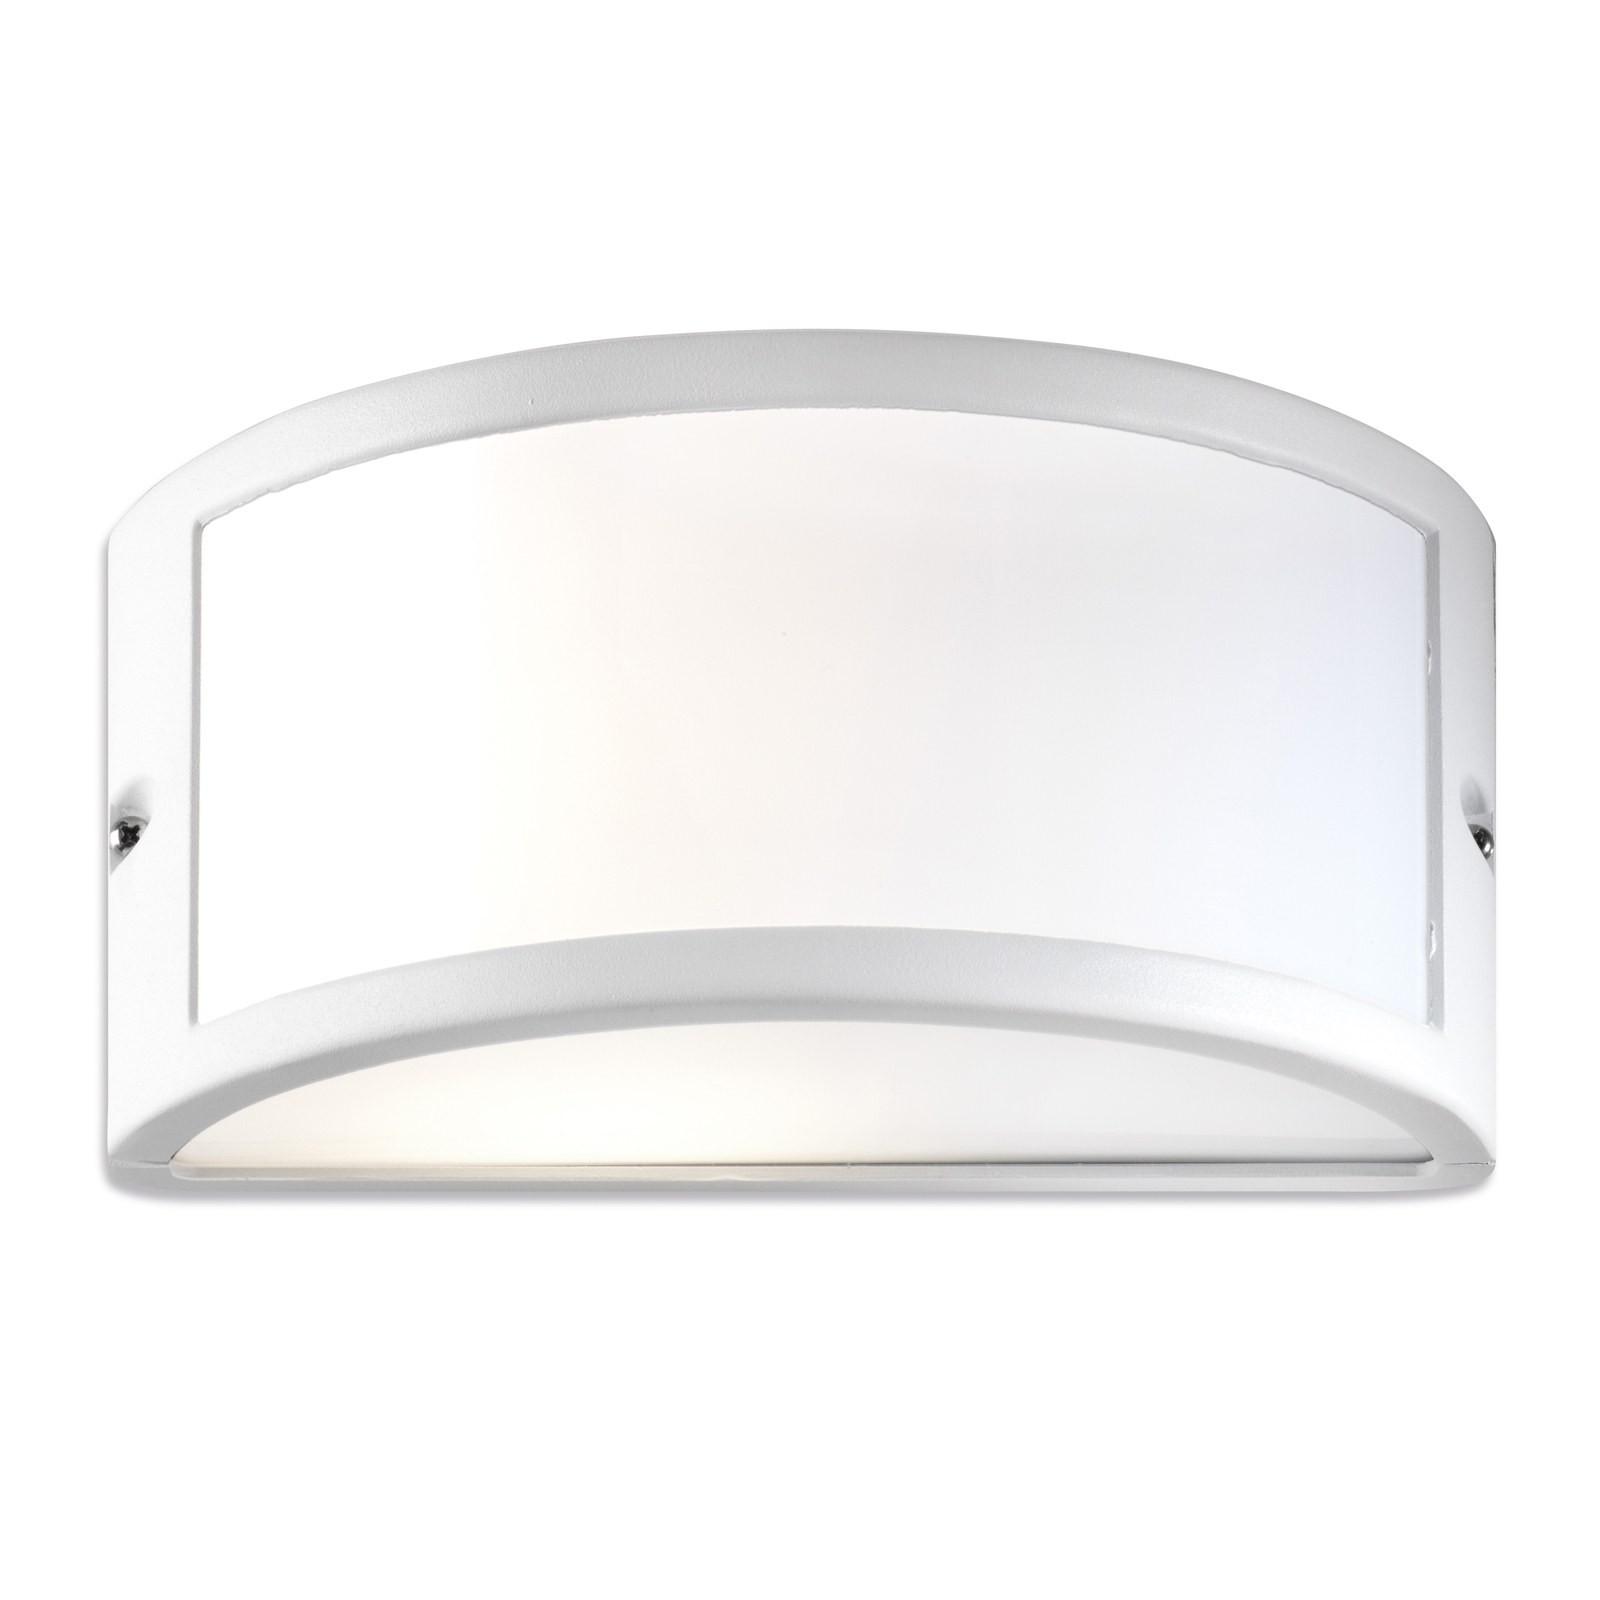 Lampade da parete design economiche sj52 regardsdefemmes - Lampade applique ikea ...